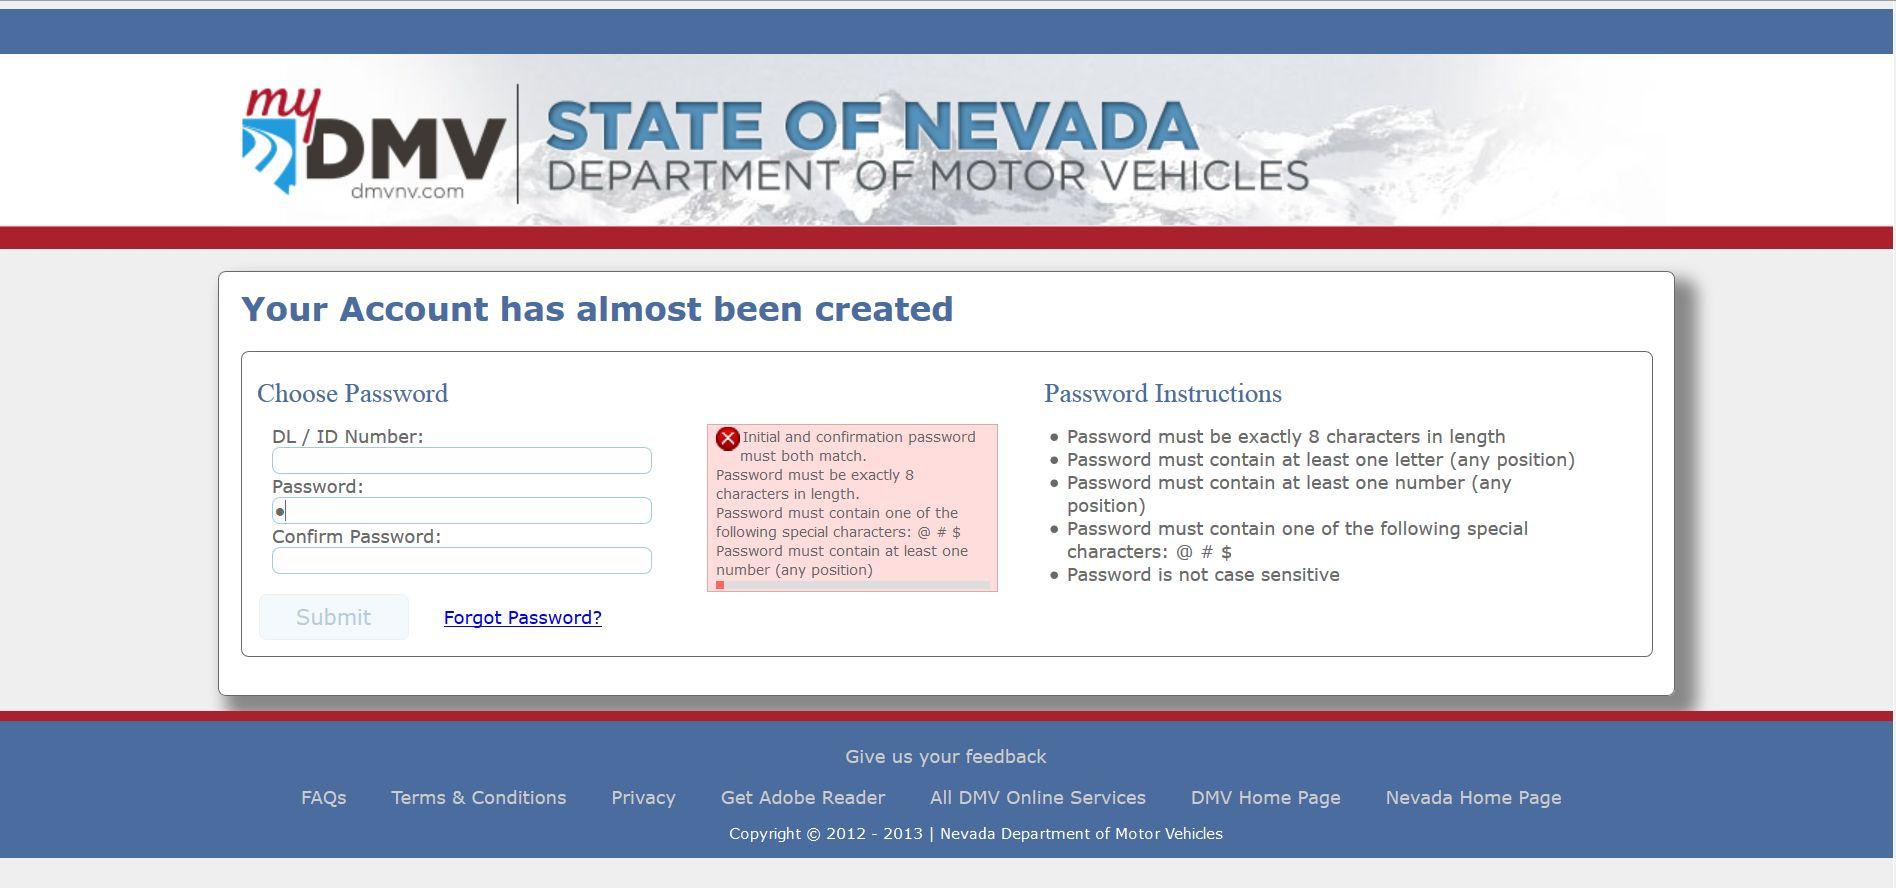 Nevada DMV password restrictions